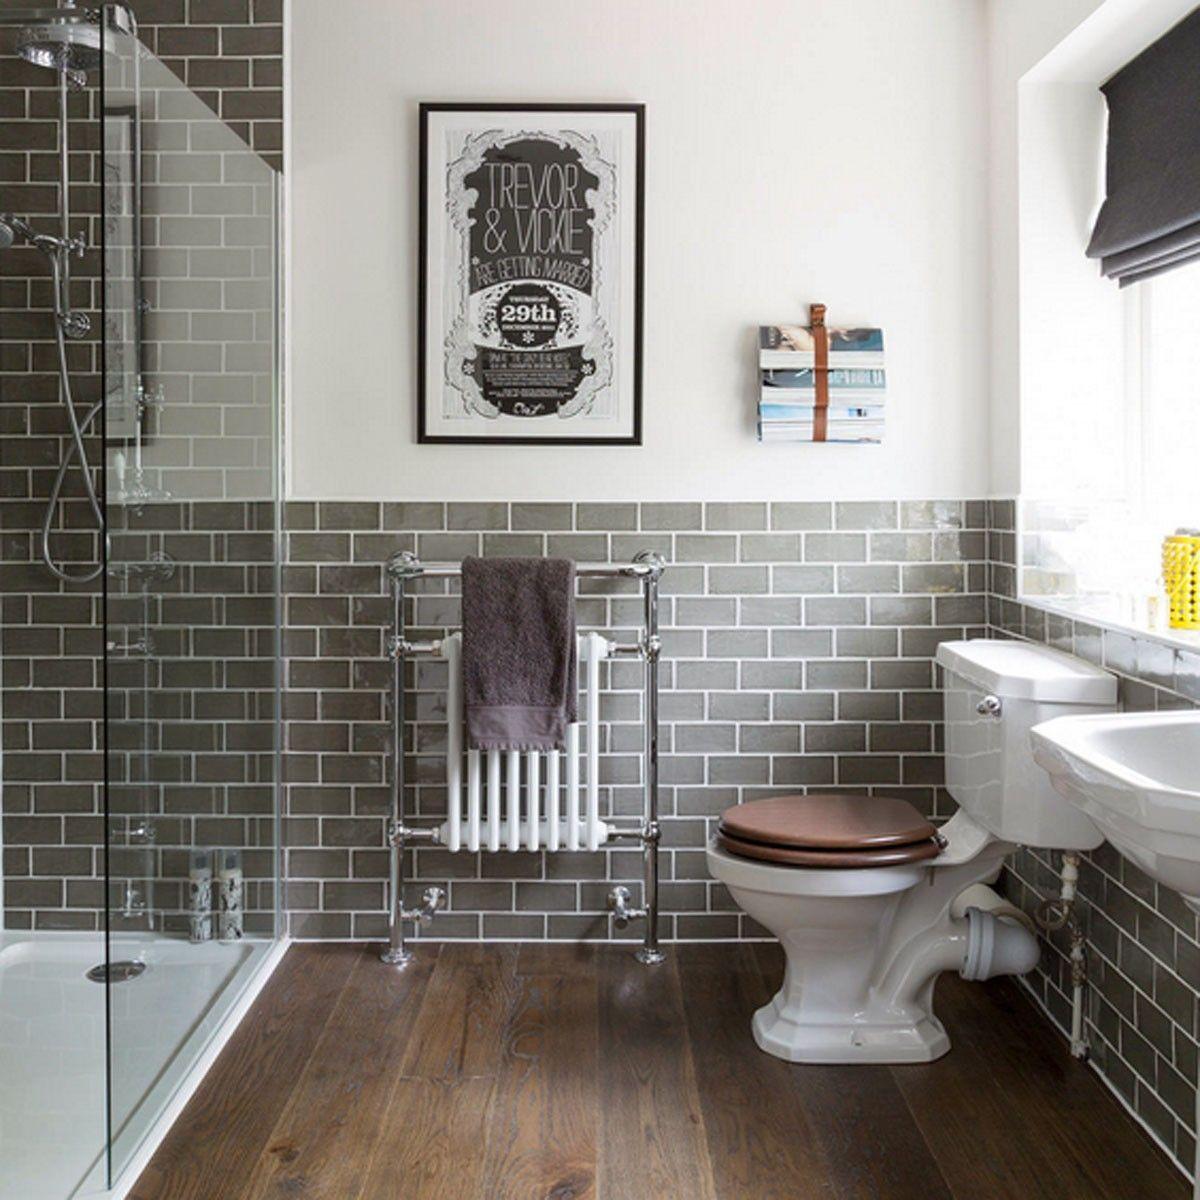 15x7 5 Rustico Grafito Wall Tile Crown Tiles Small Master Bathroom Bathroom Remodel Master Bathrooms Remodel